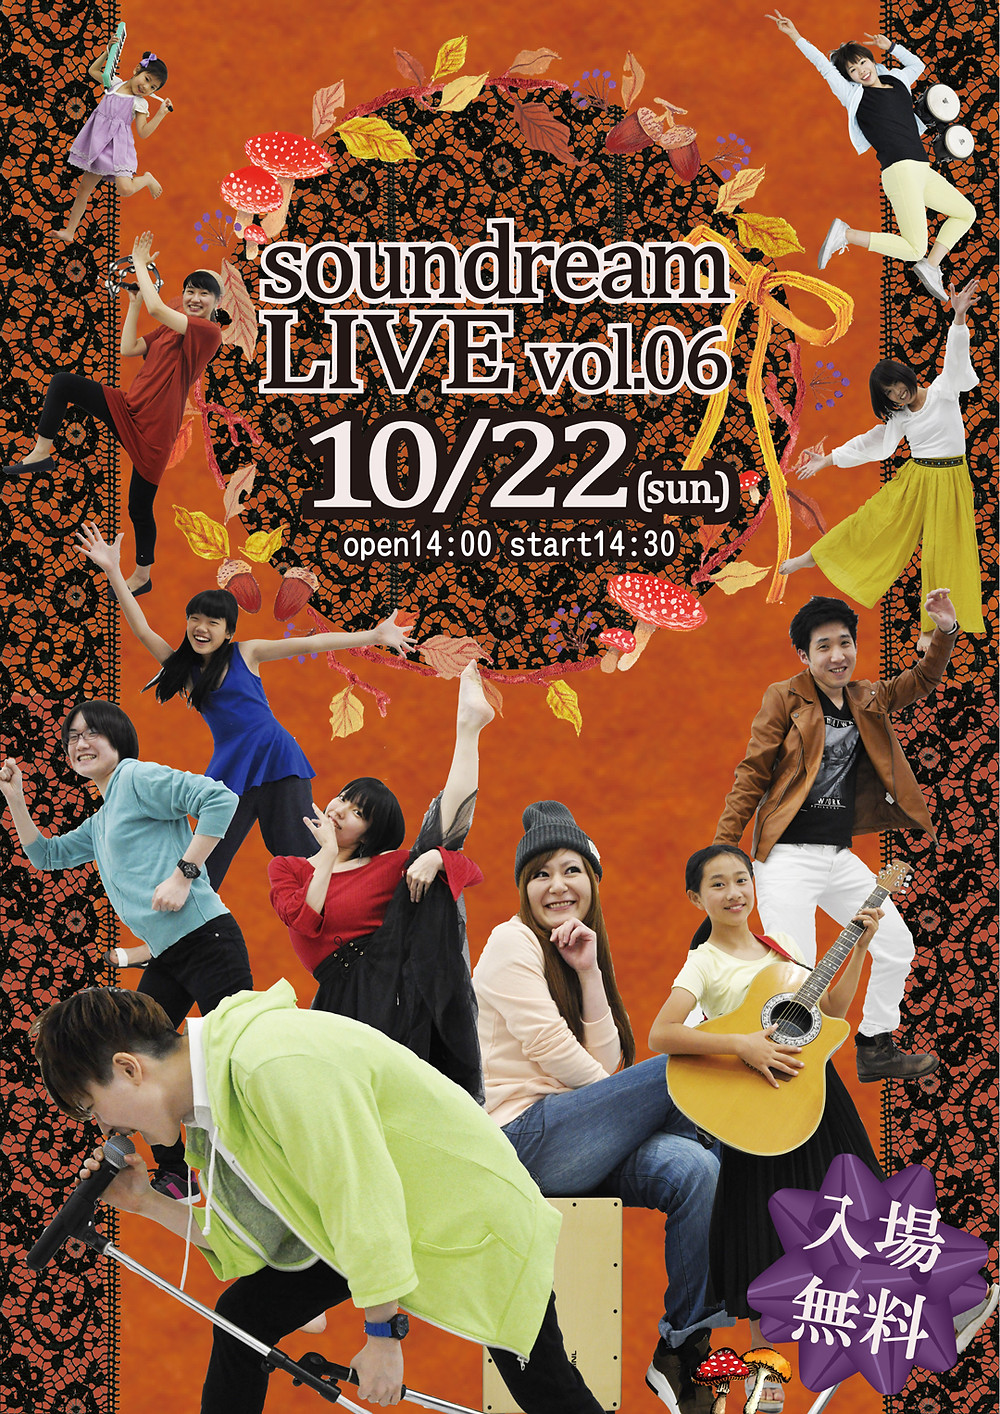 soundream サウンドリーム ブログ blog ライブ フライヤー